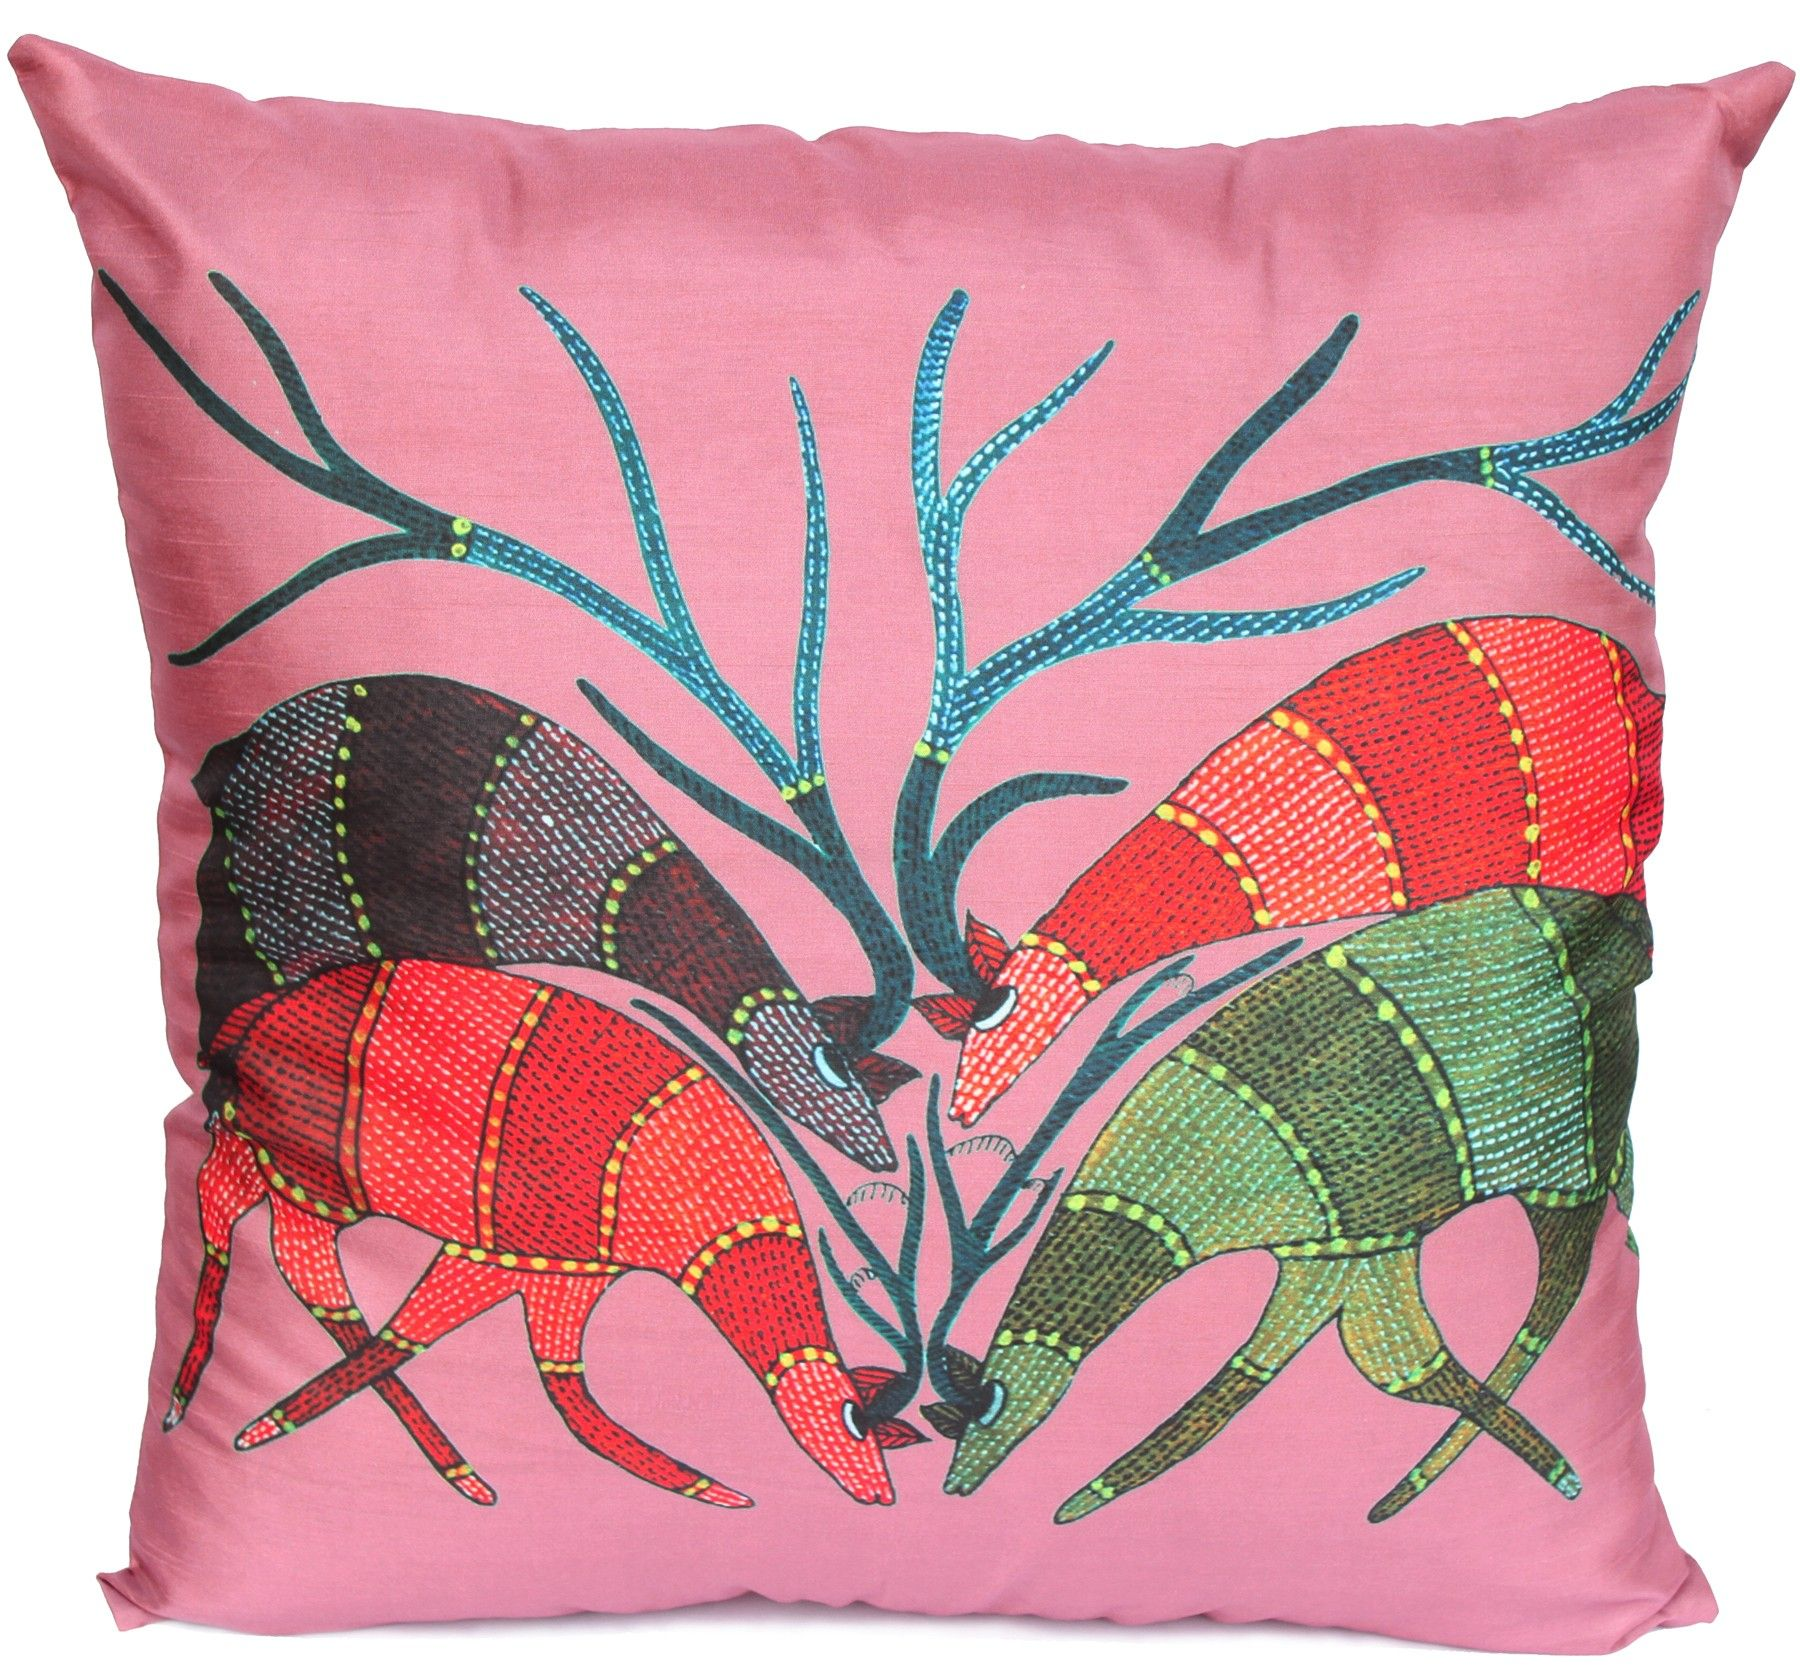 Priceless Buck - 18 x 18\u201d Multicolor Art Pillow / Cushion Cover \u2013 Decorative Antlers